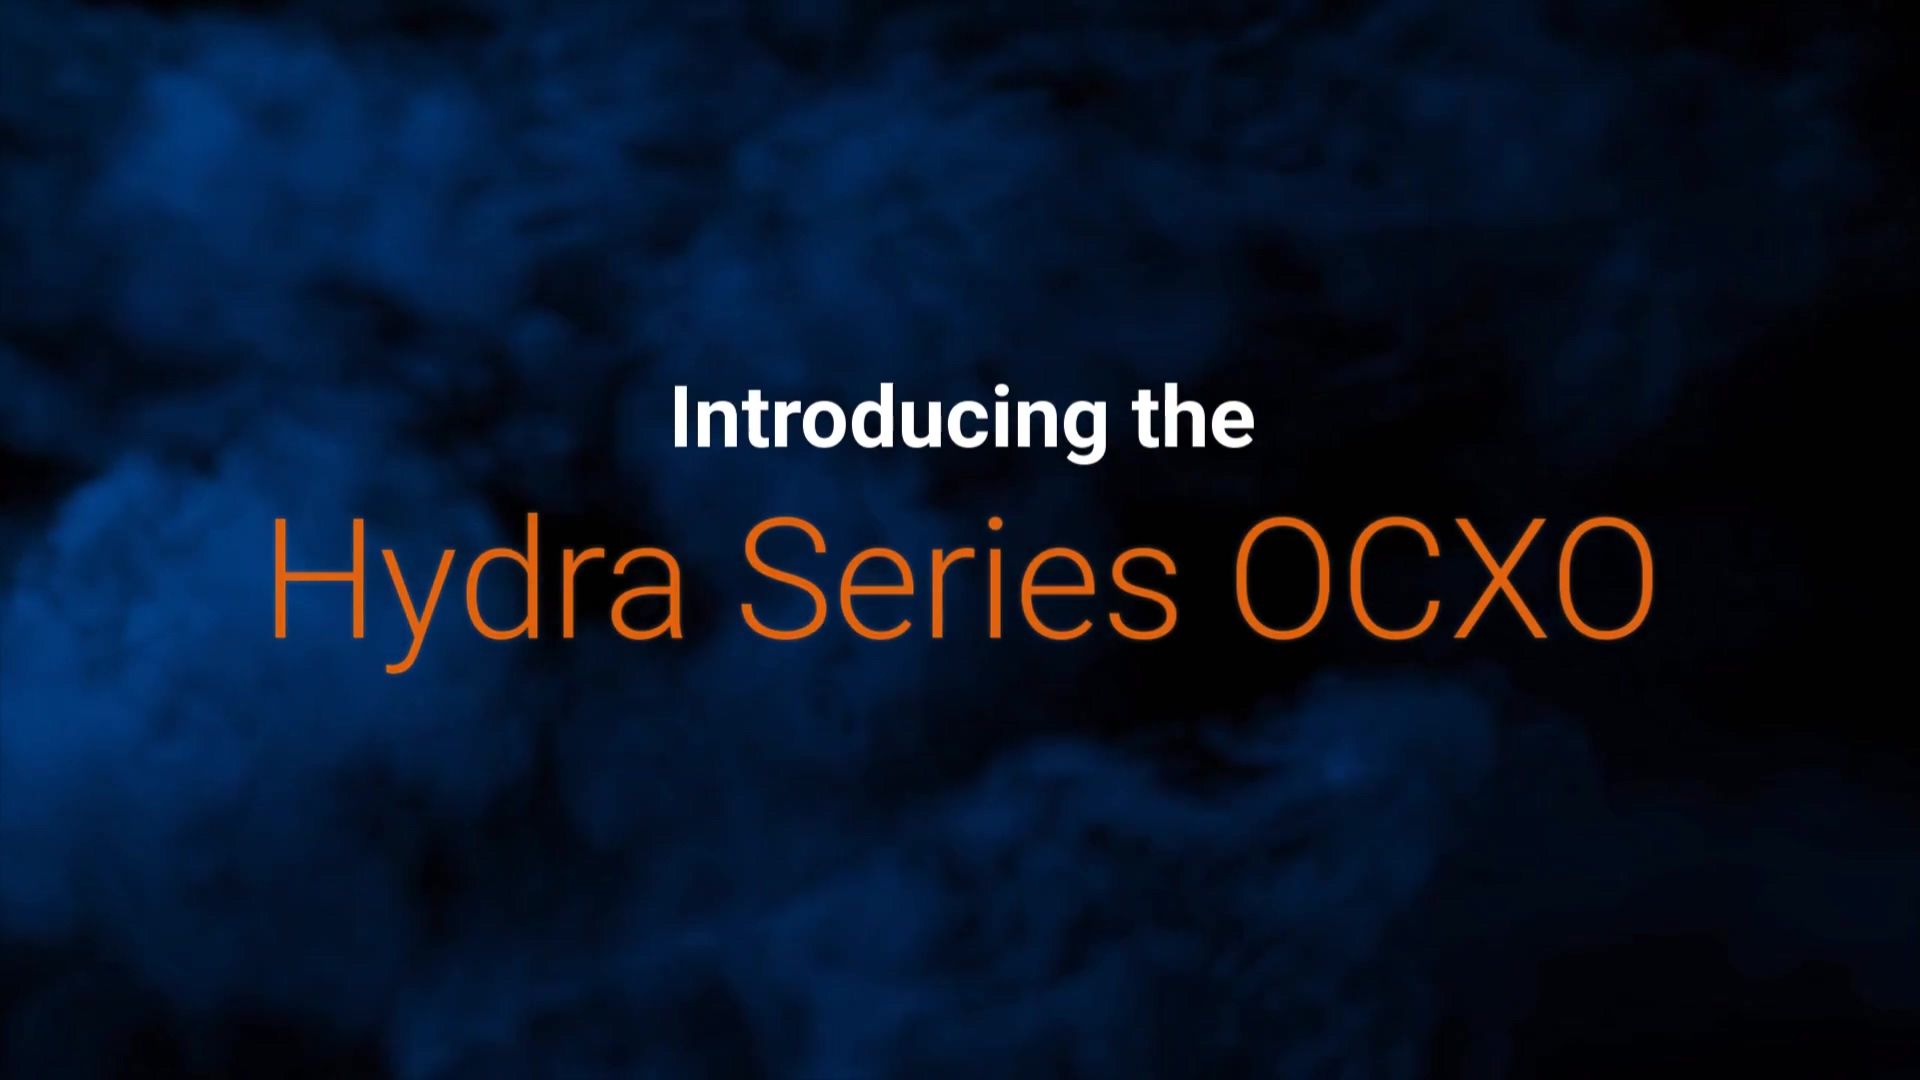 Hydra_Product_Promo_1080p